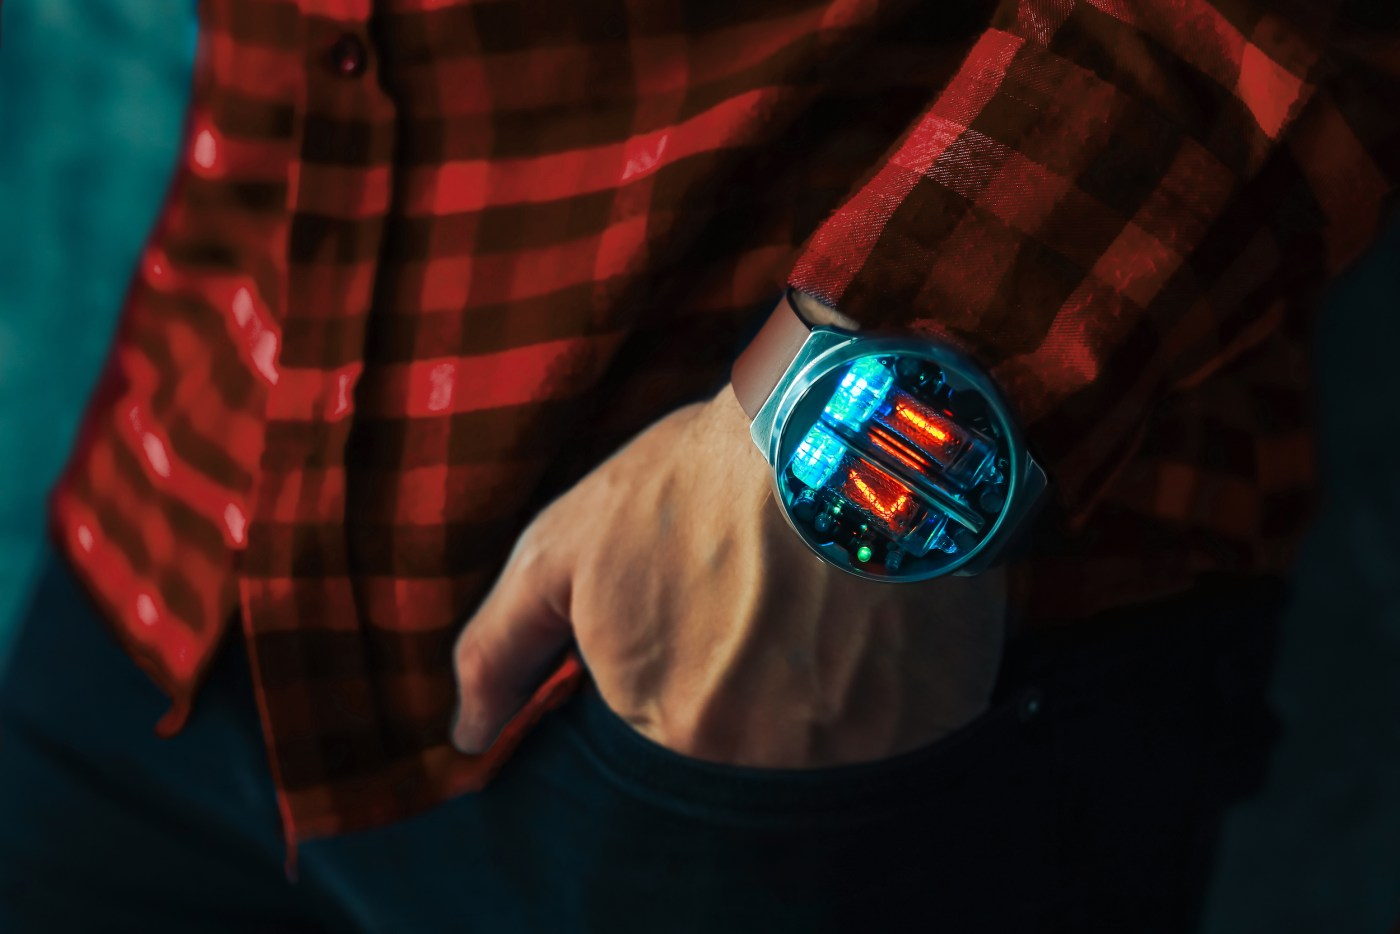 Nixoid Next wristwatch